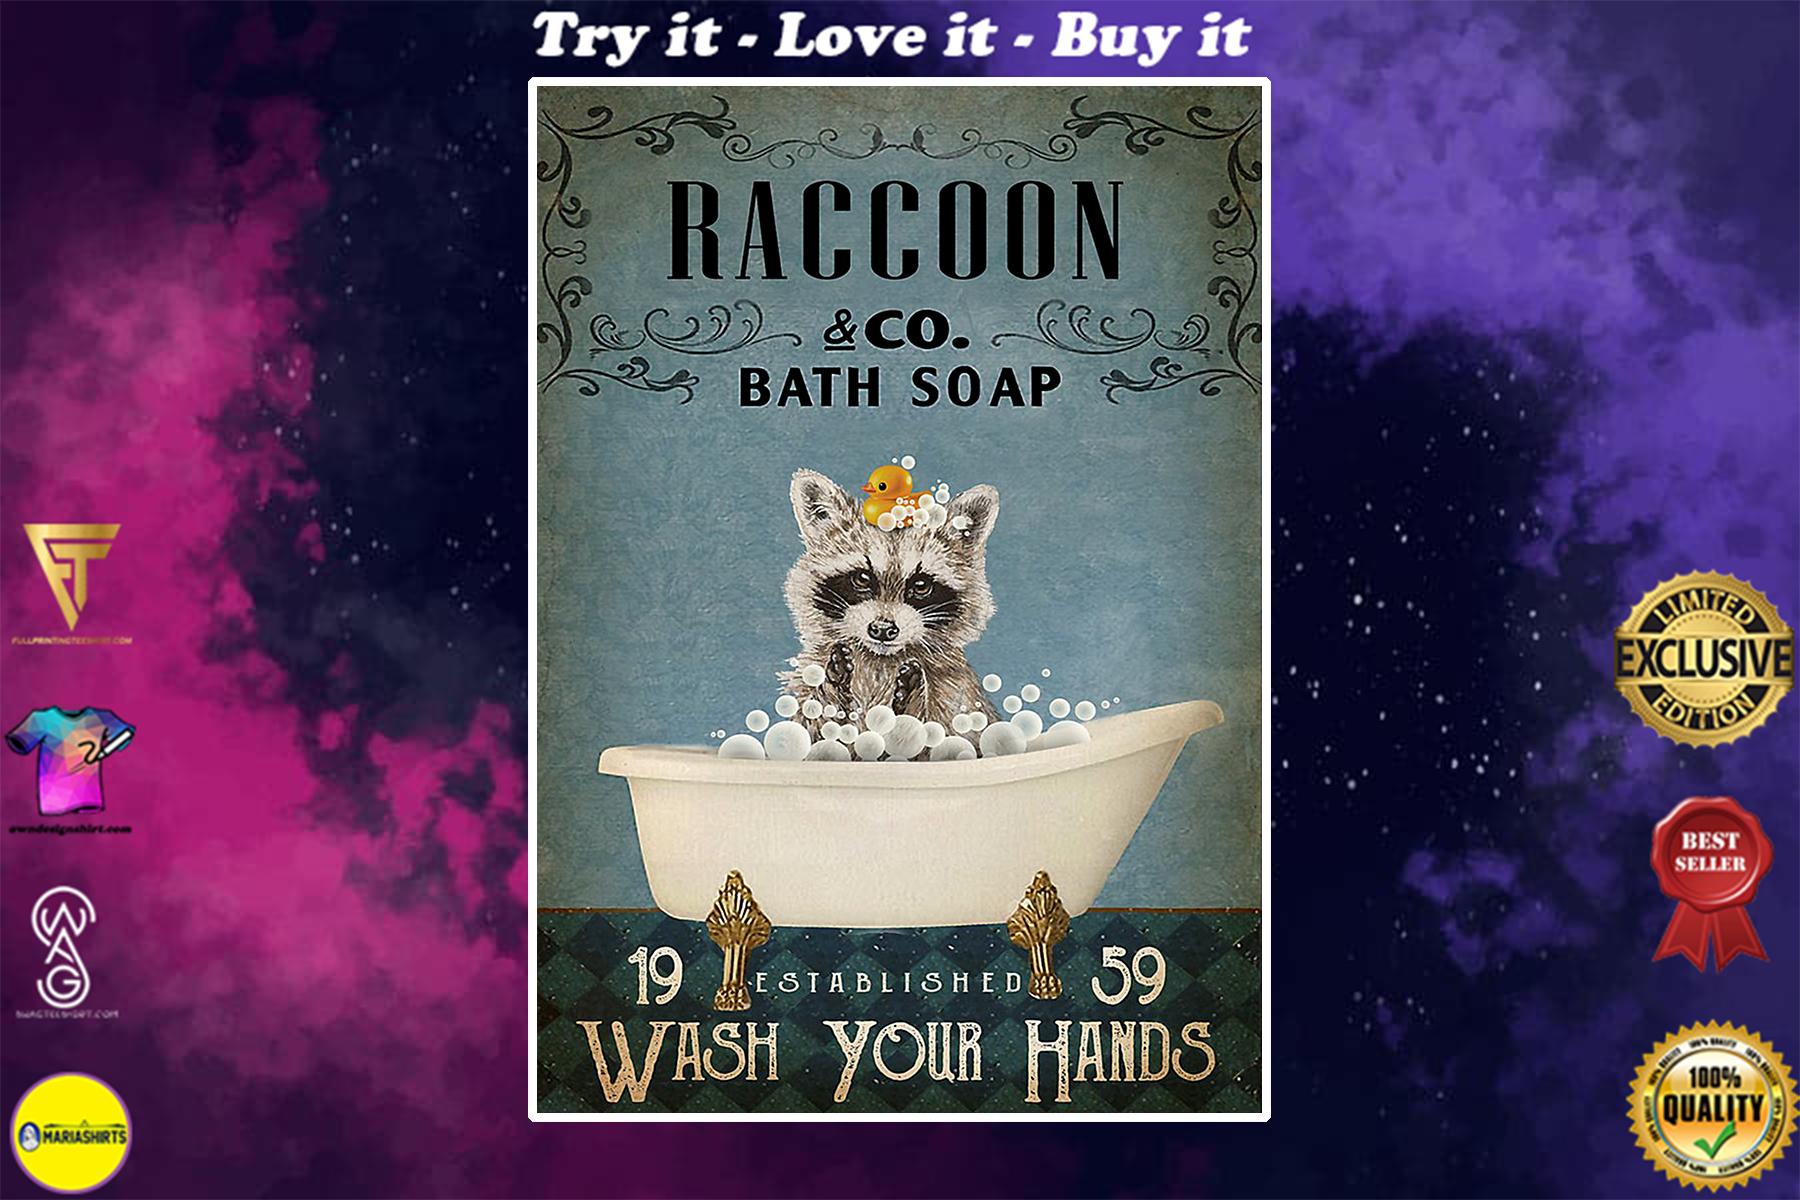 raccoon co bath soap wash your hands vintage poster